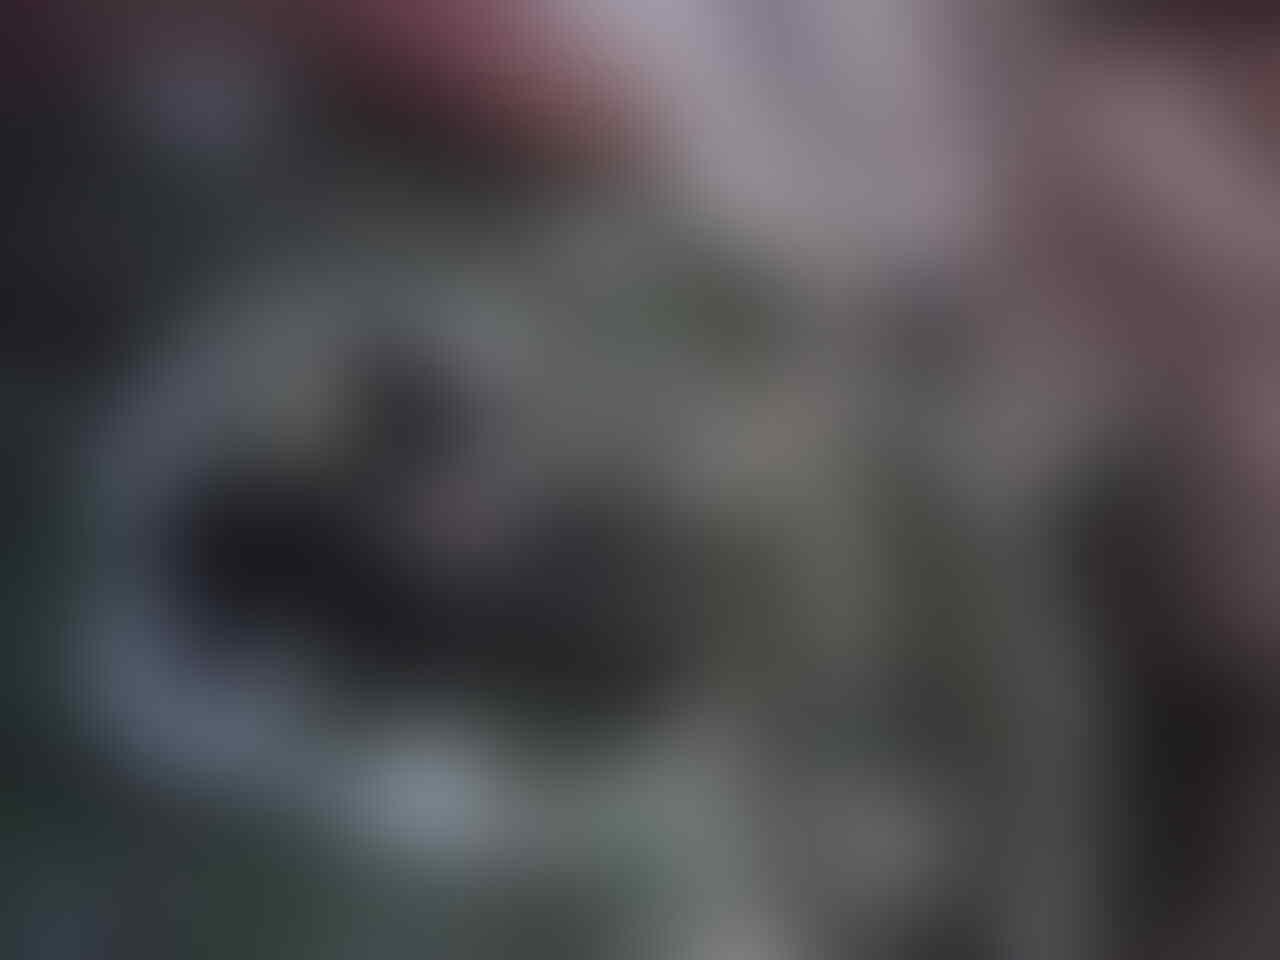 bikin jarum nyala di spedometer satria fu